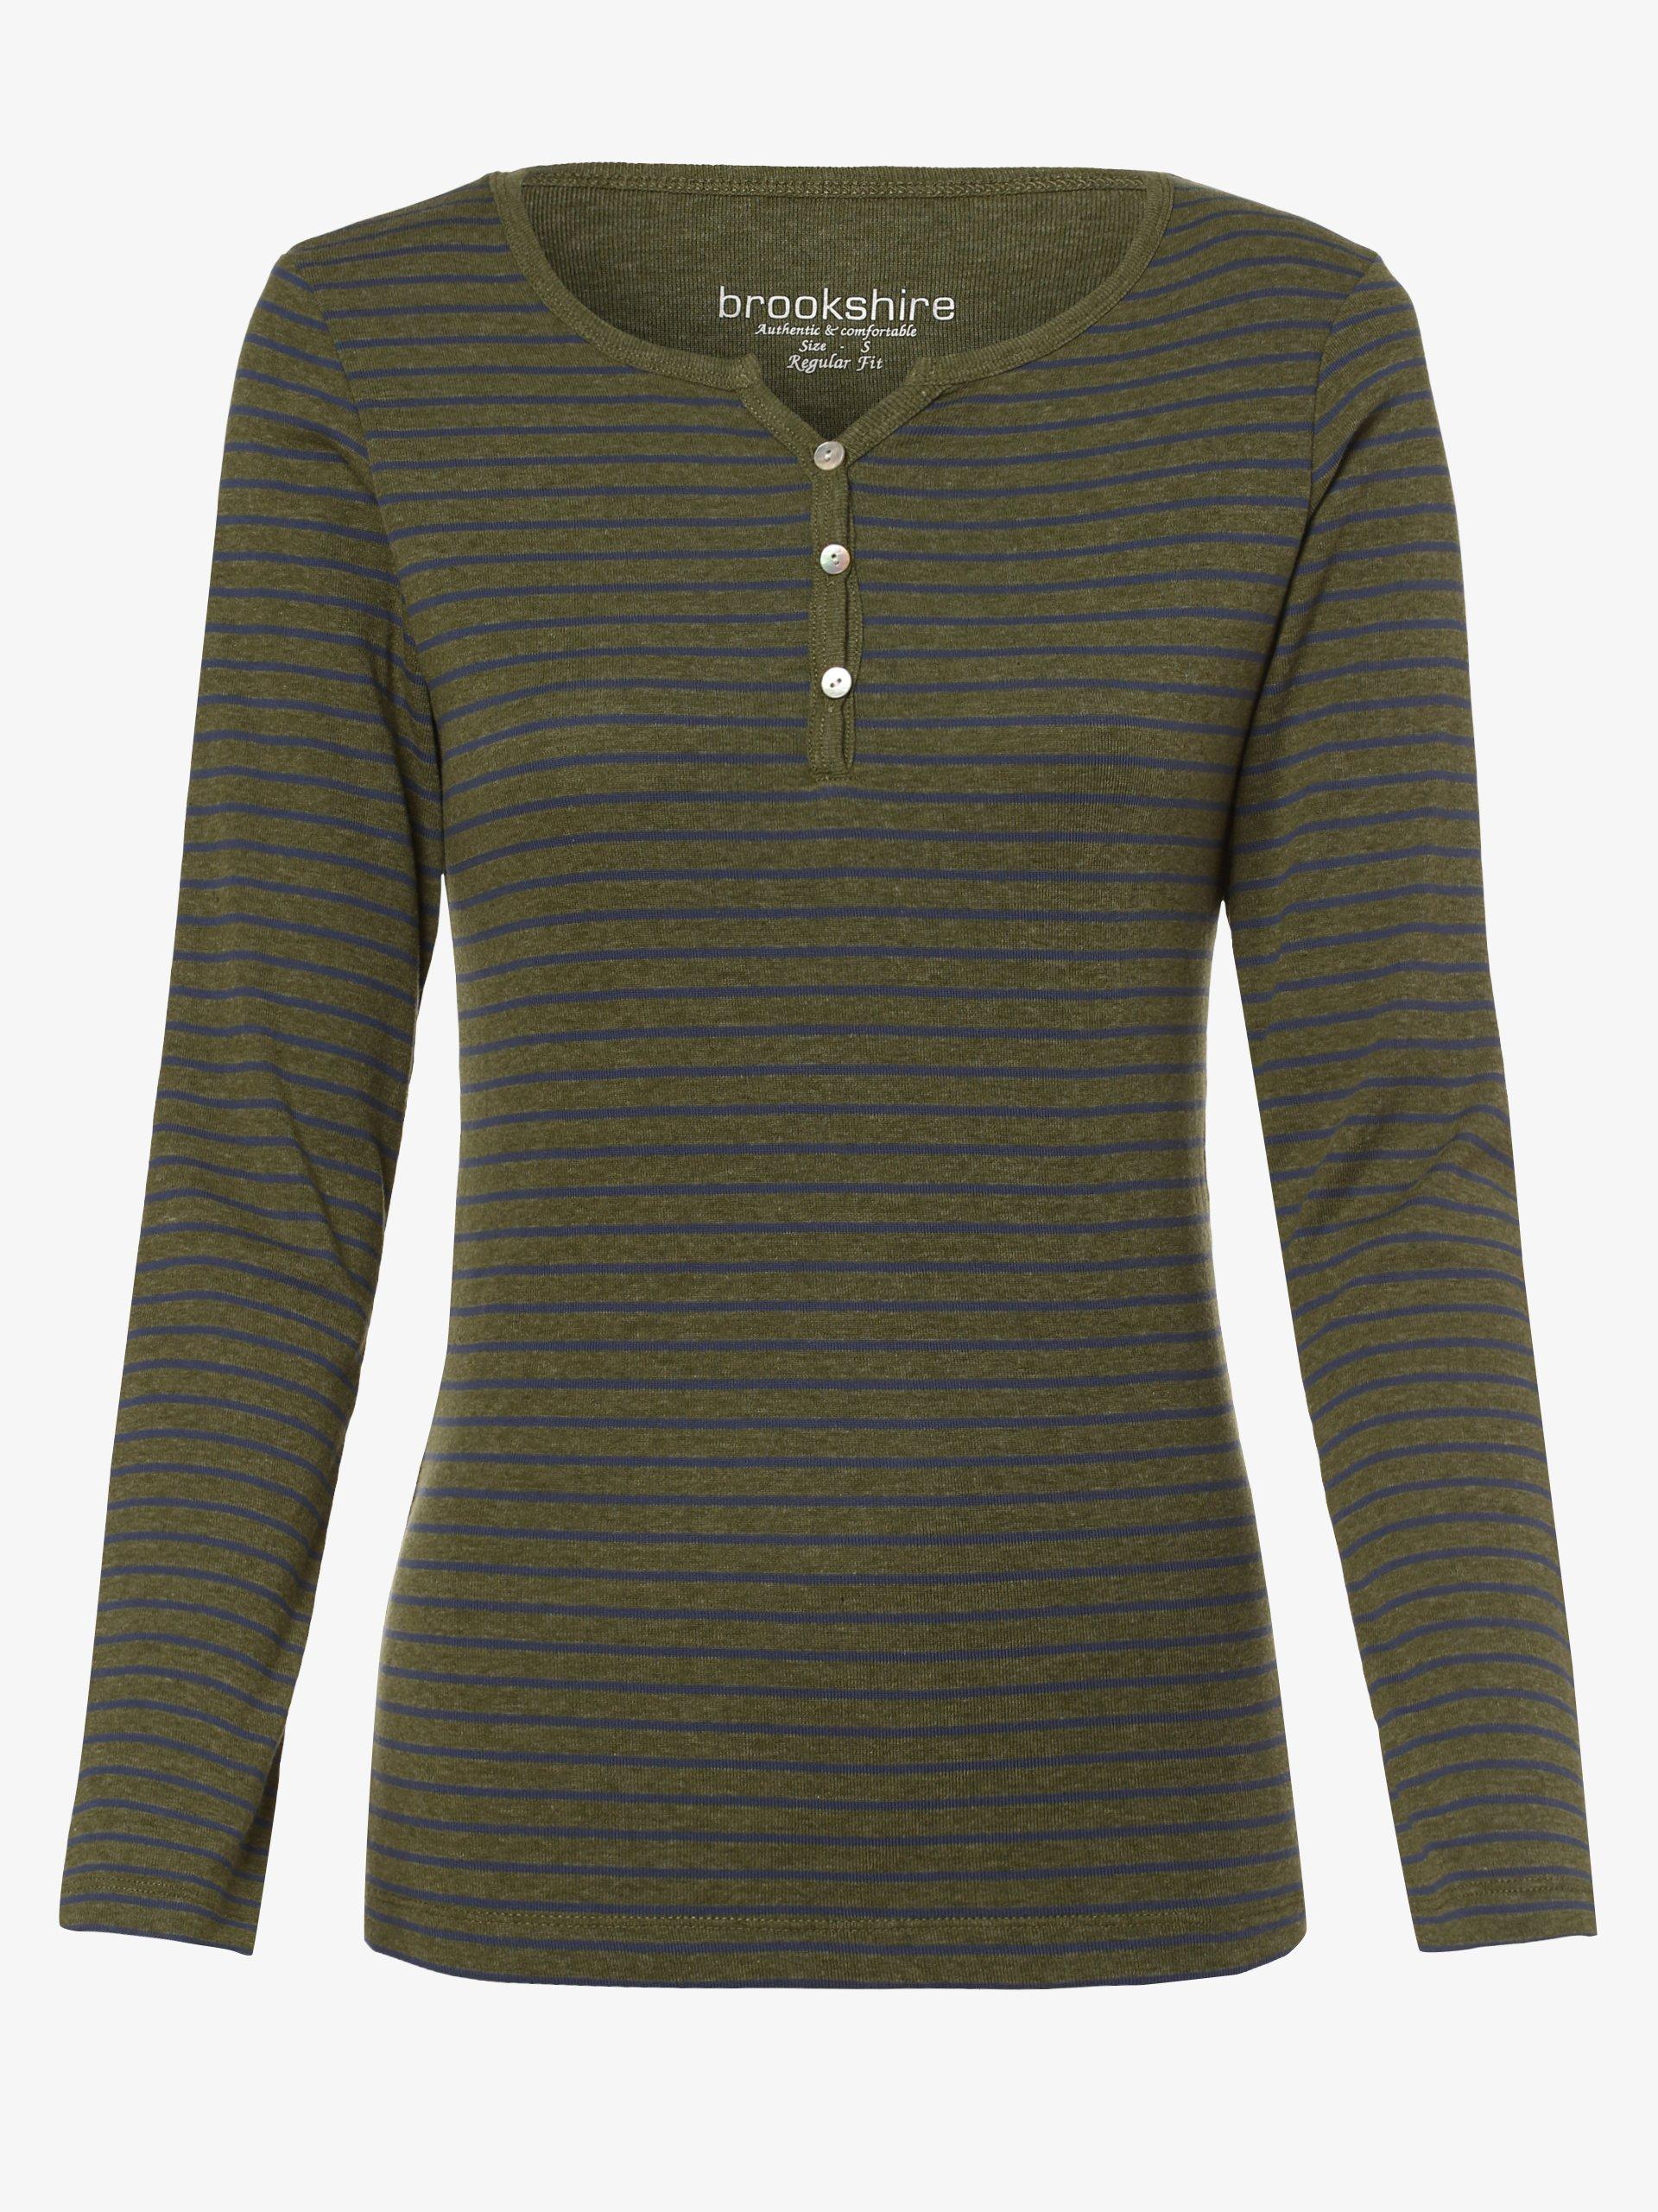 brookshire Damska koszulka z długim rękawem